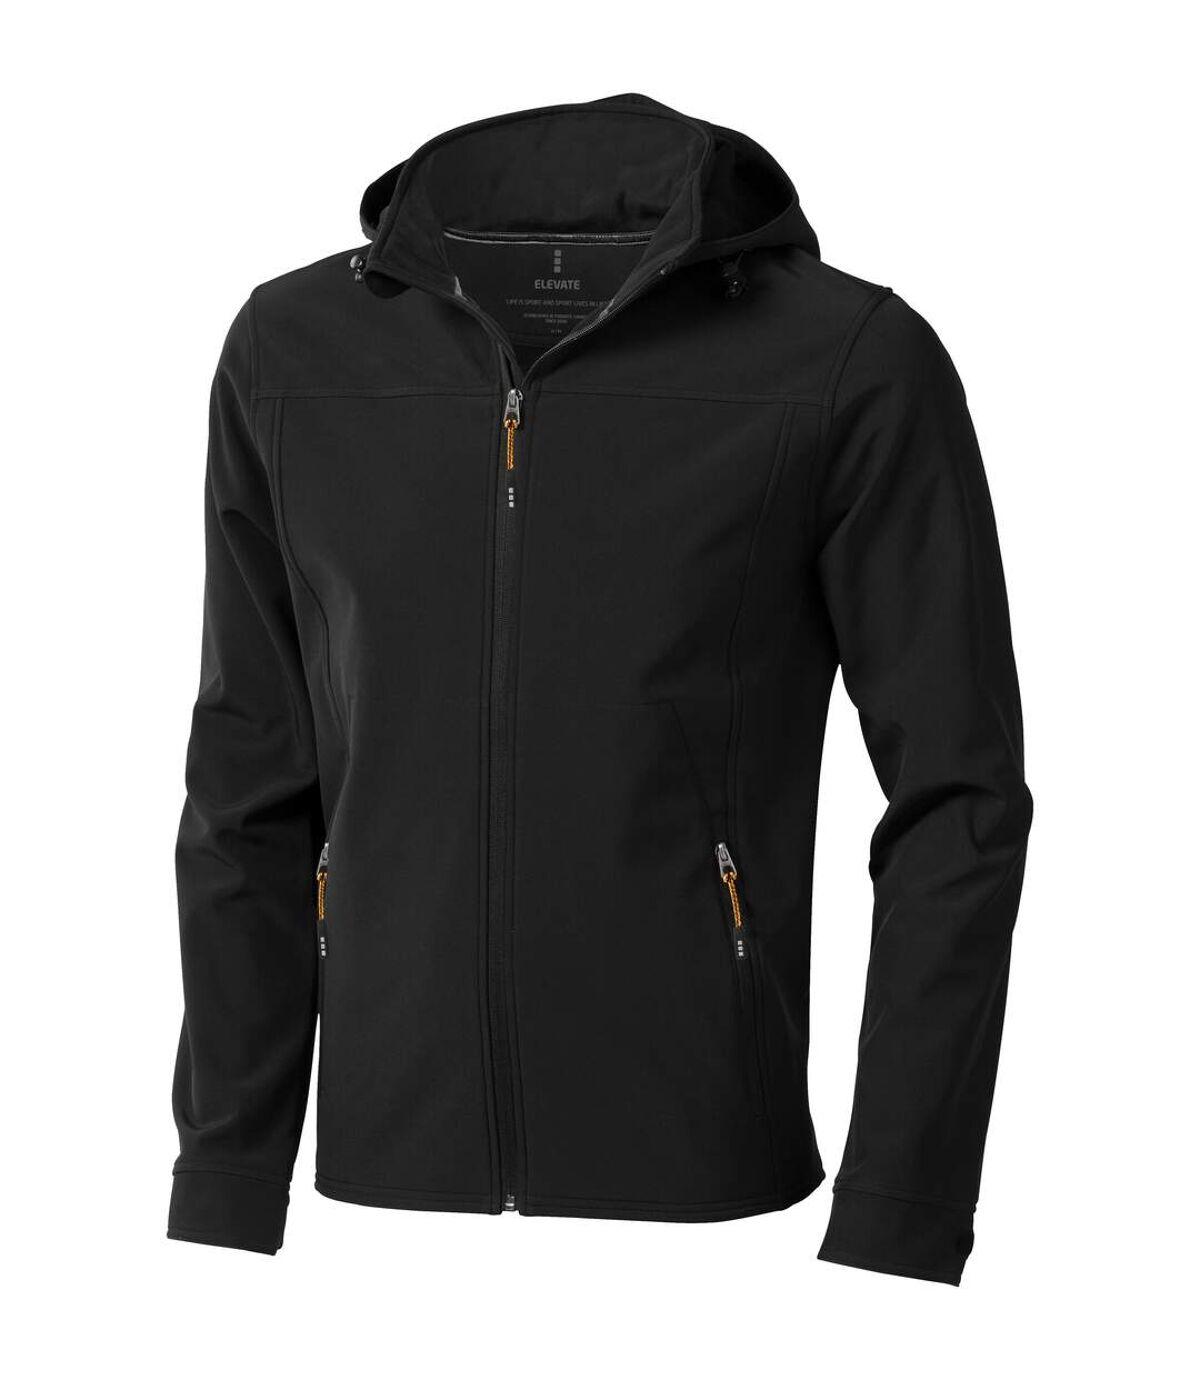 Elevate Mens Langley Softshell Jacket (Solid Black) - UTPF1907